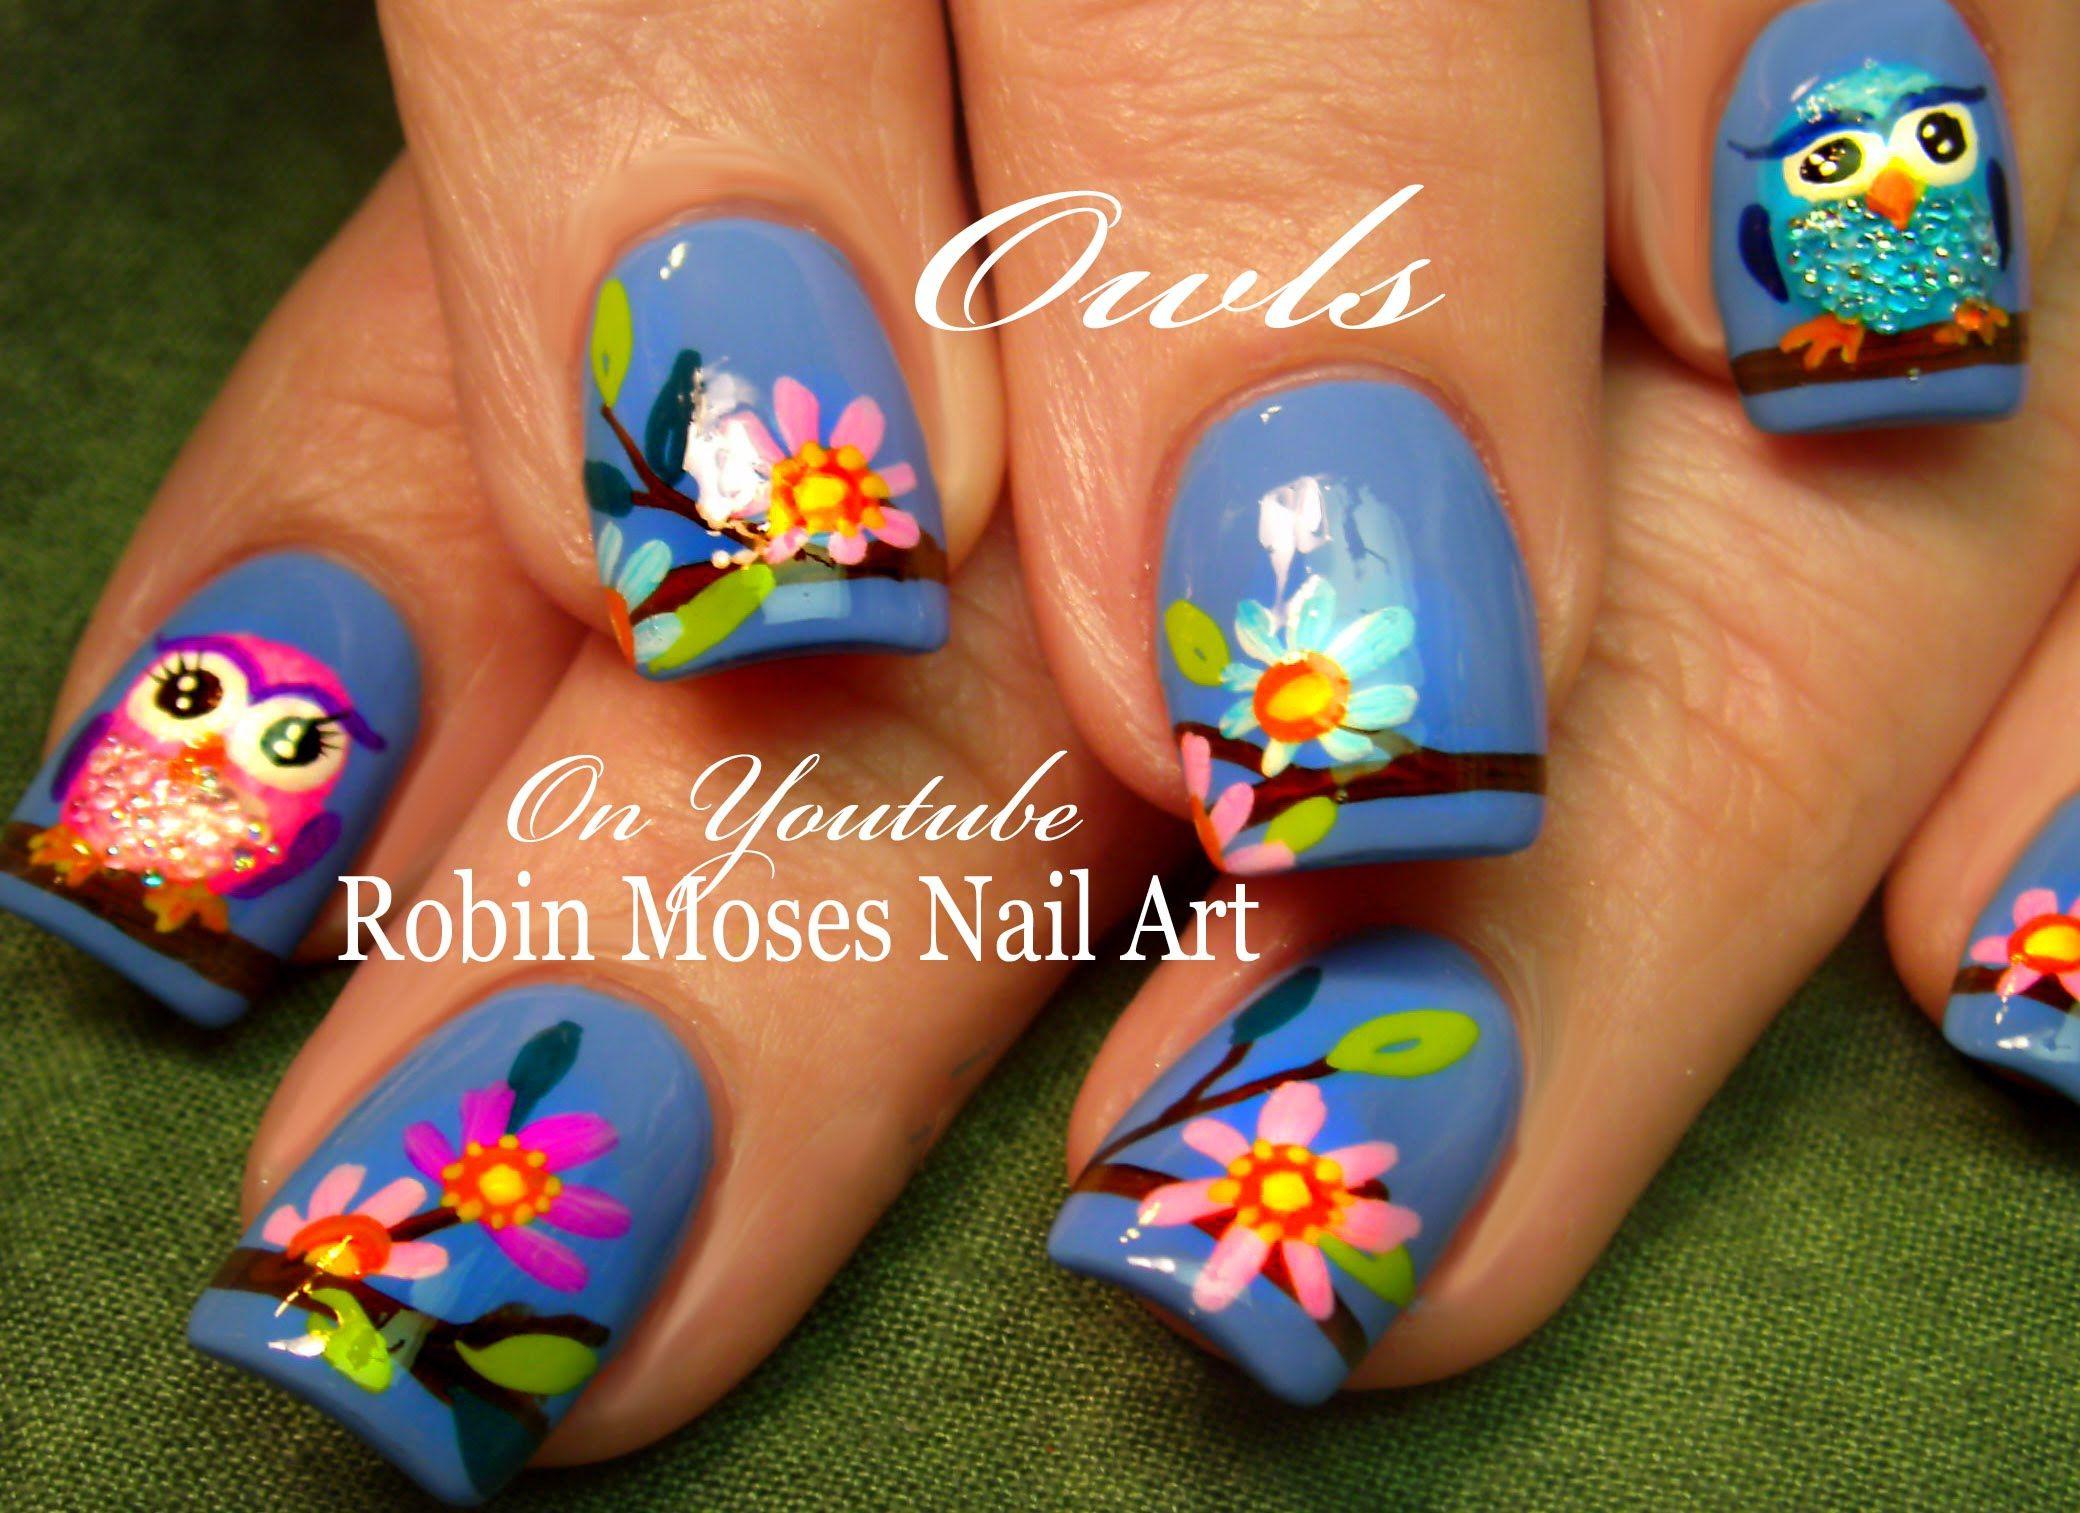 Cute spring nail designs easy do yourself papillon day spa cute spring nail designs easy do yourself solutioingenieria Choice Image